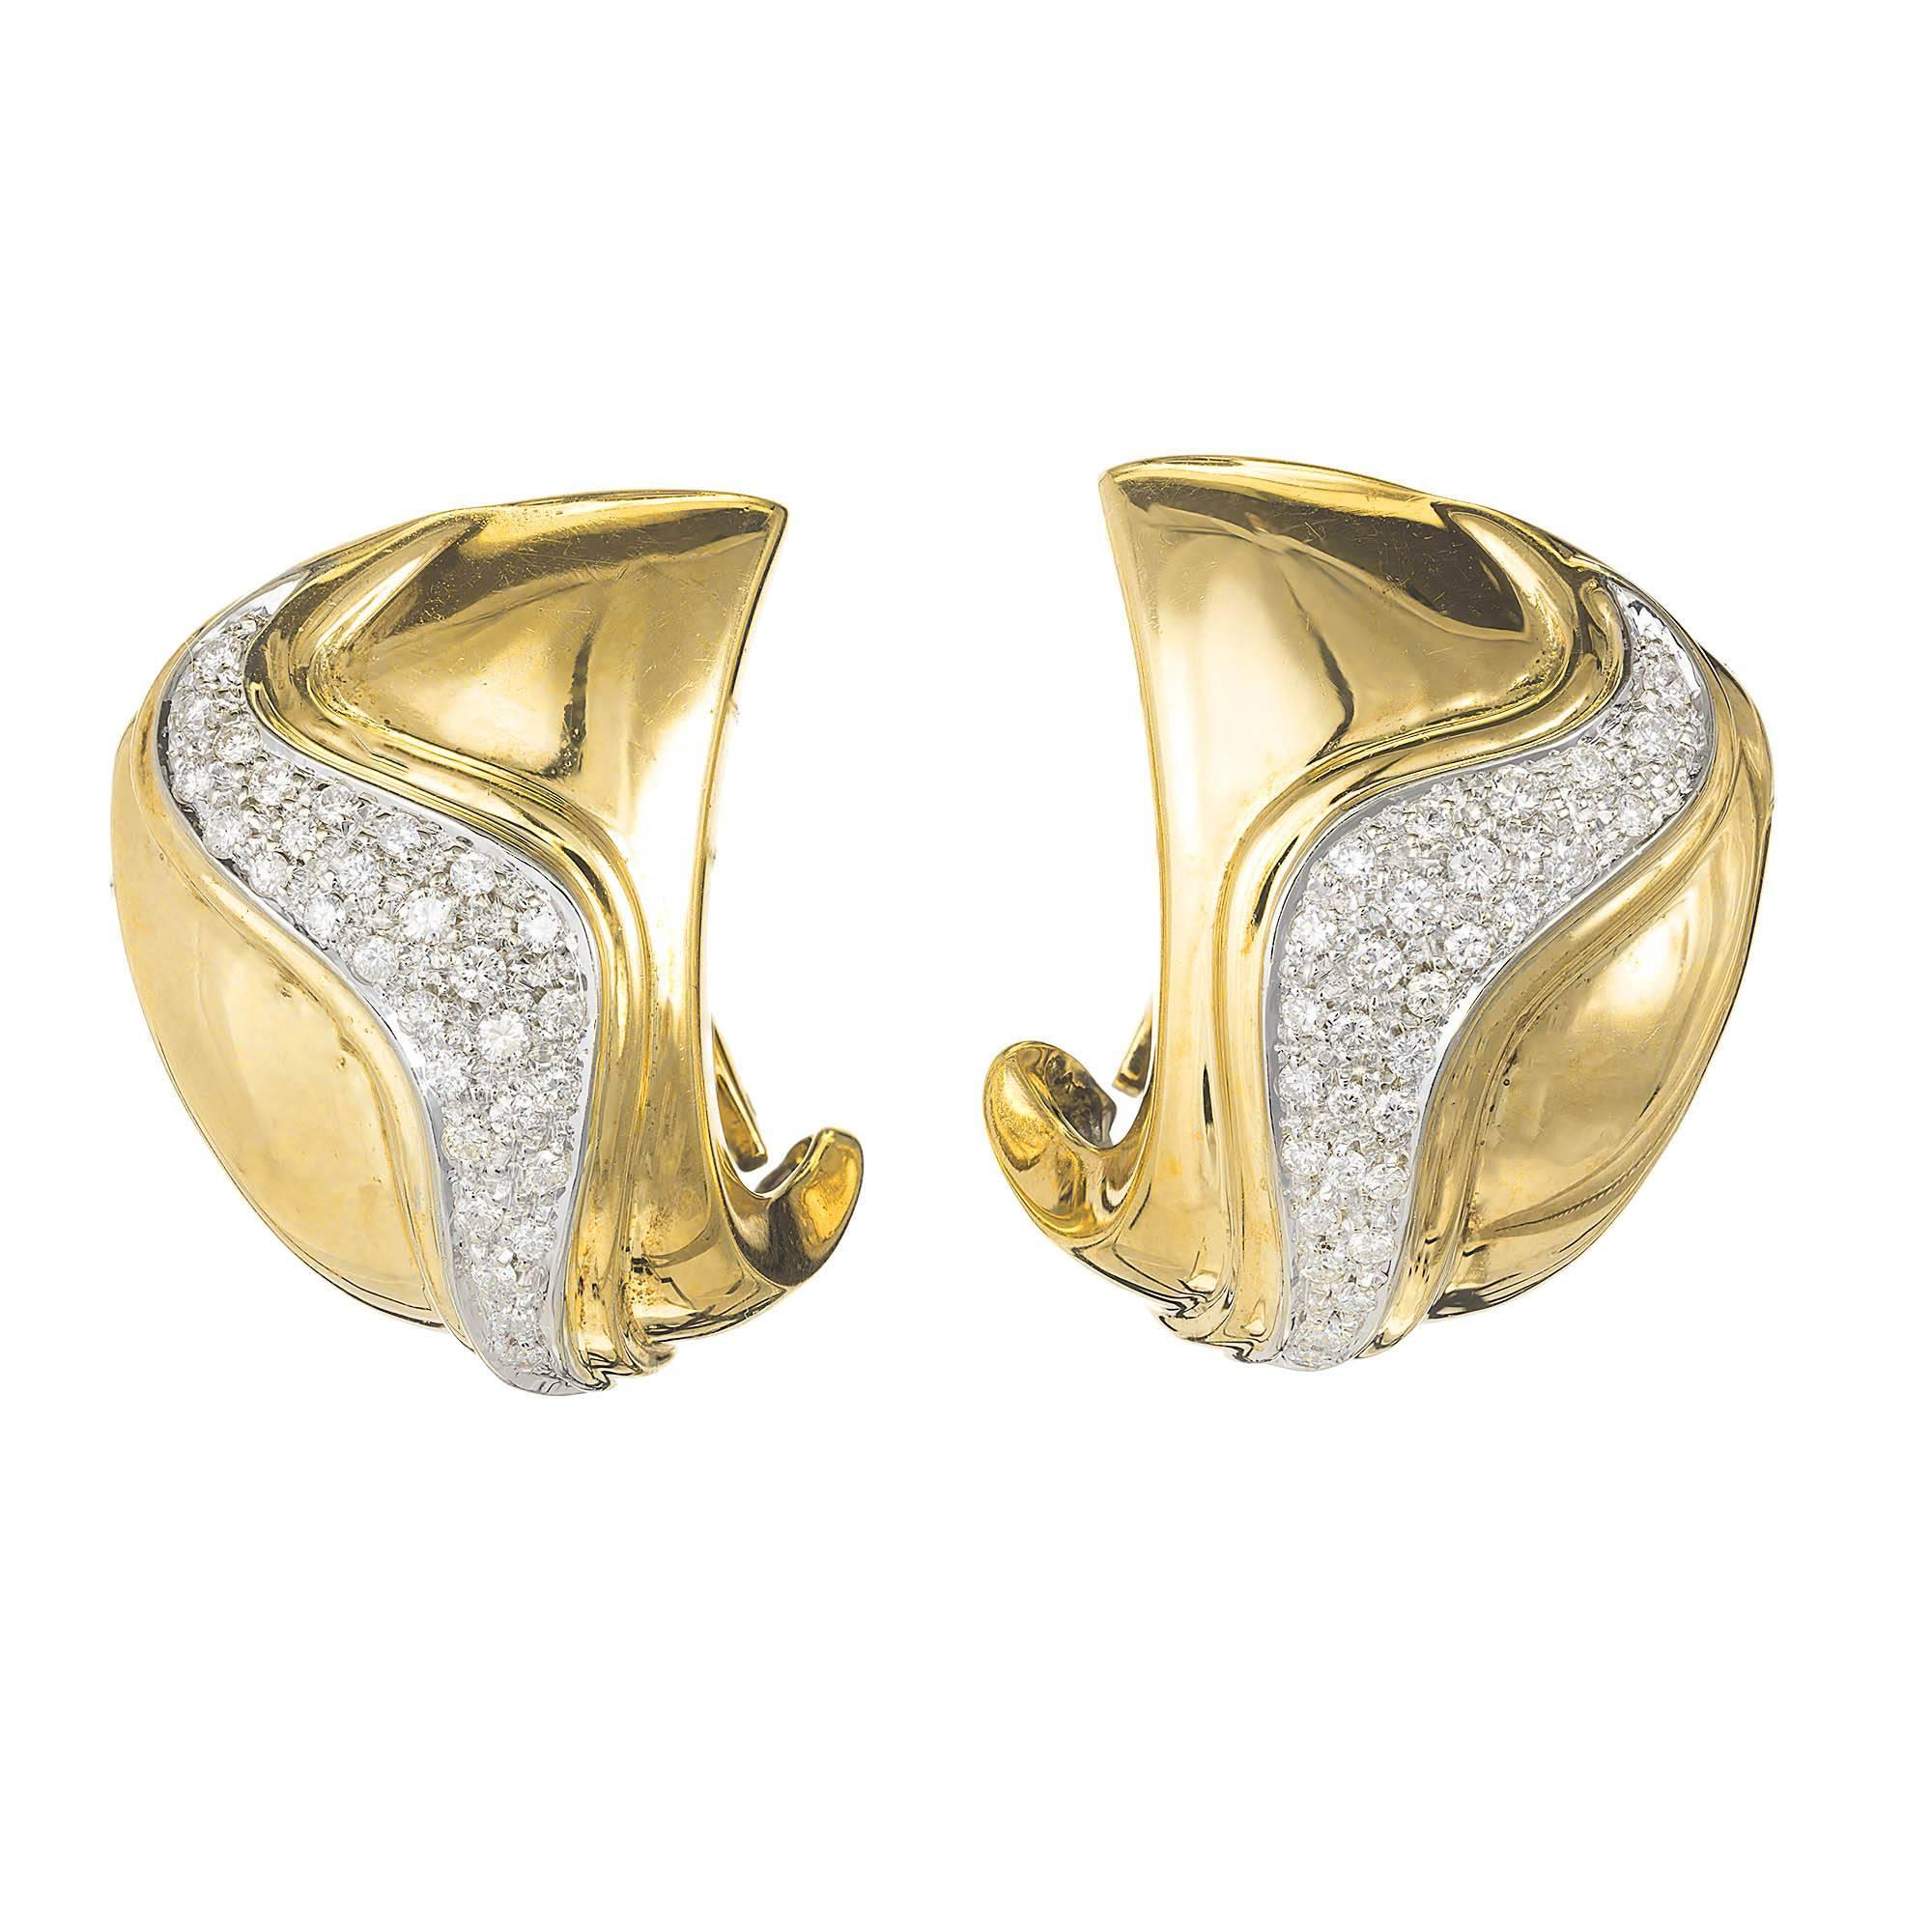 1.00 Carat Diamond Yellow Gold Swirl Earrings